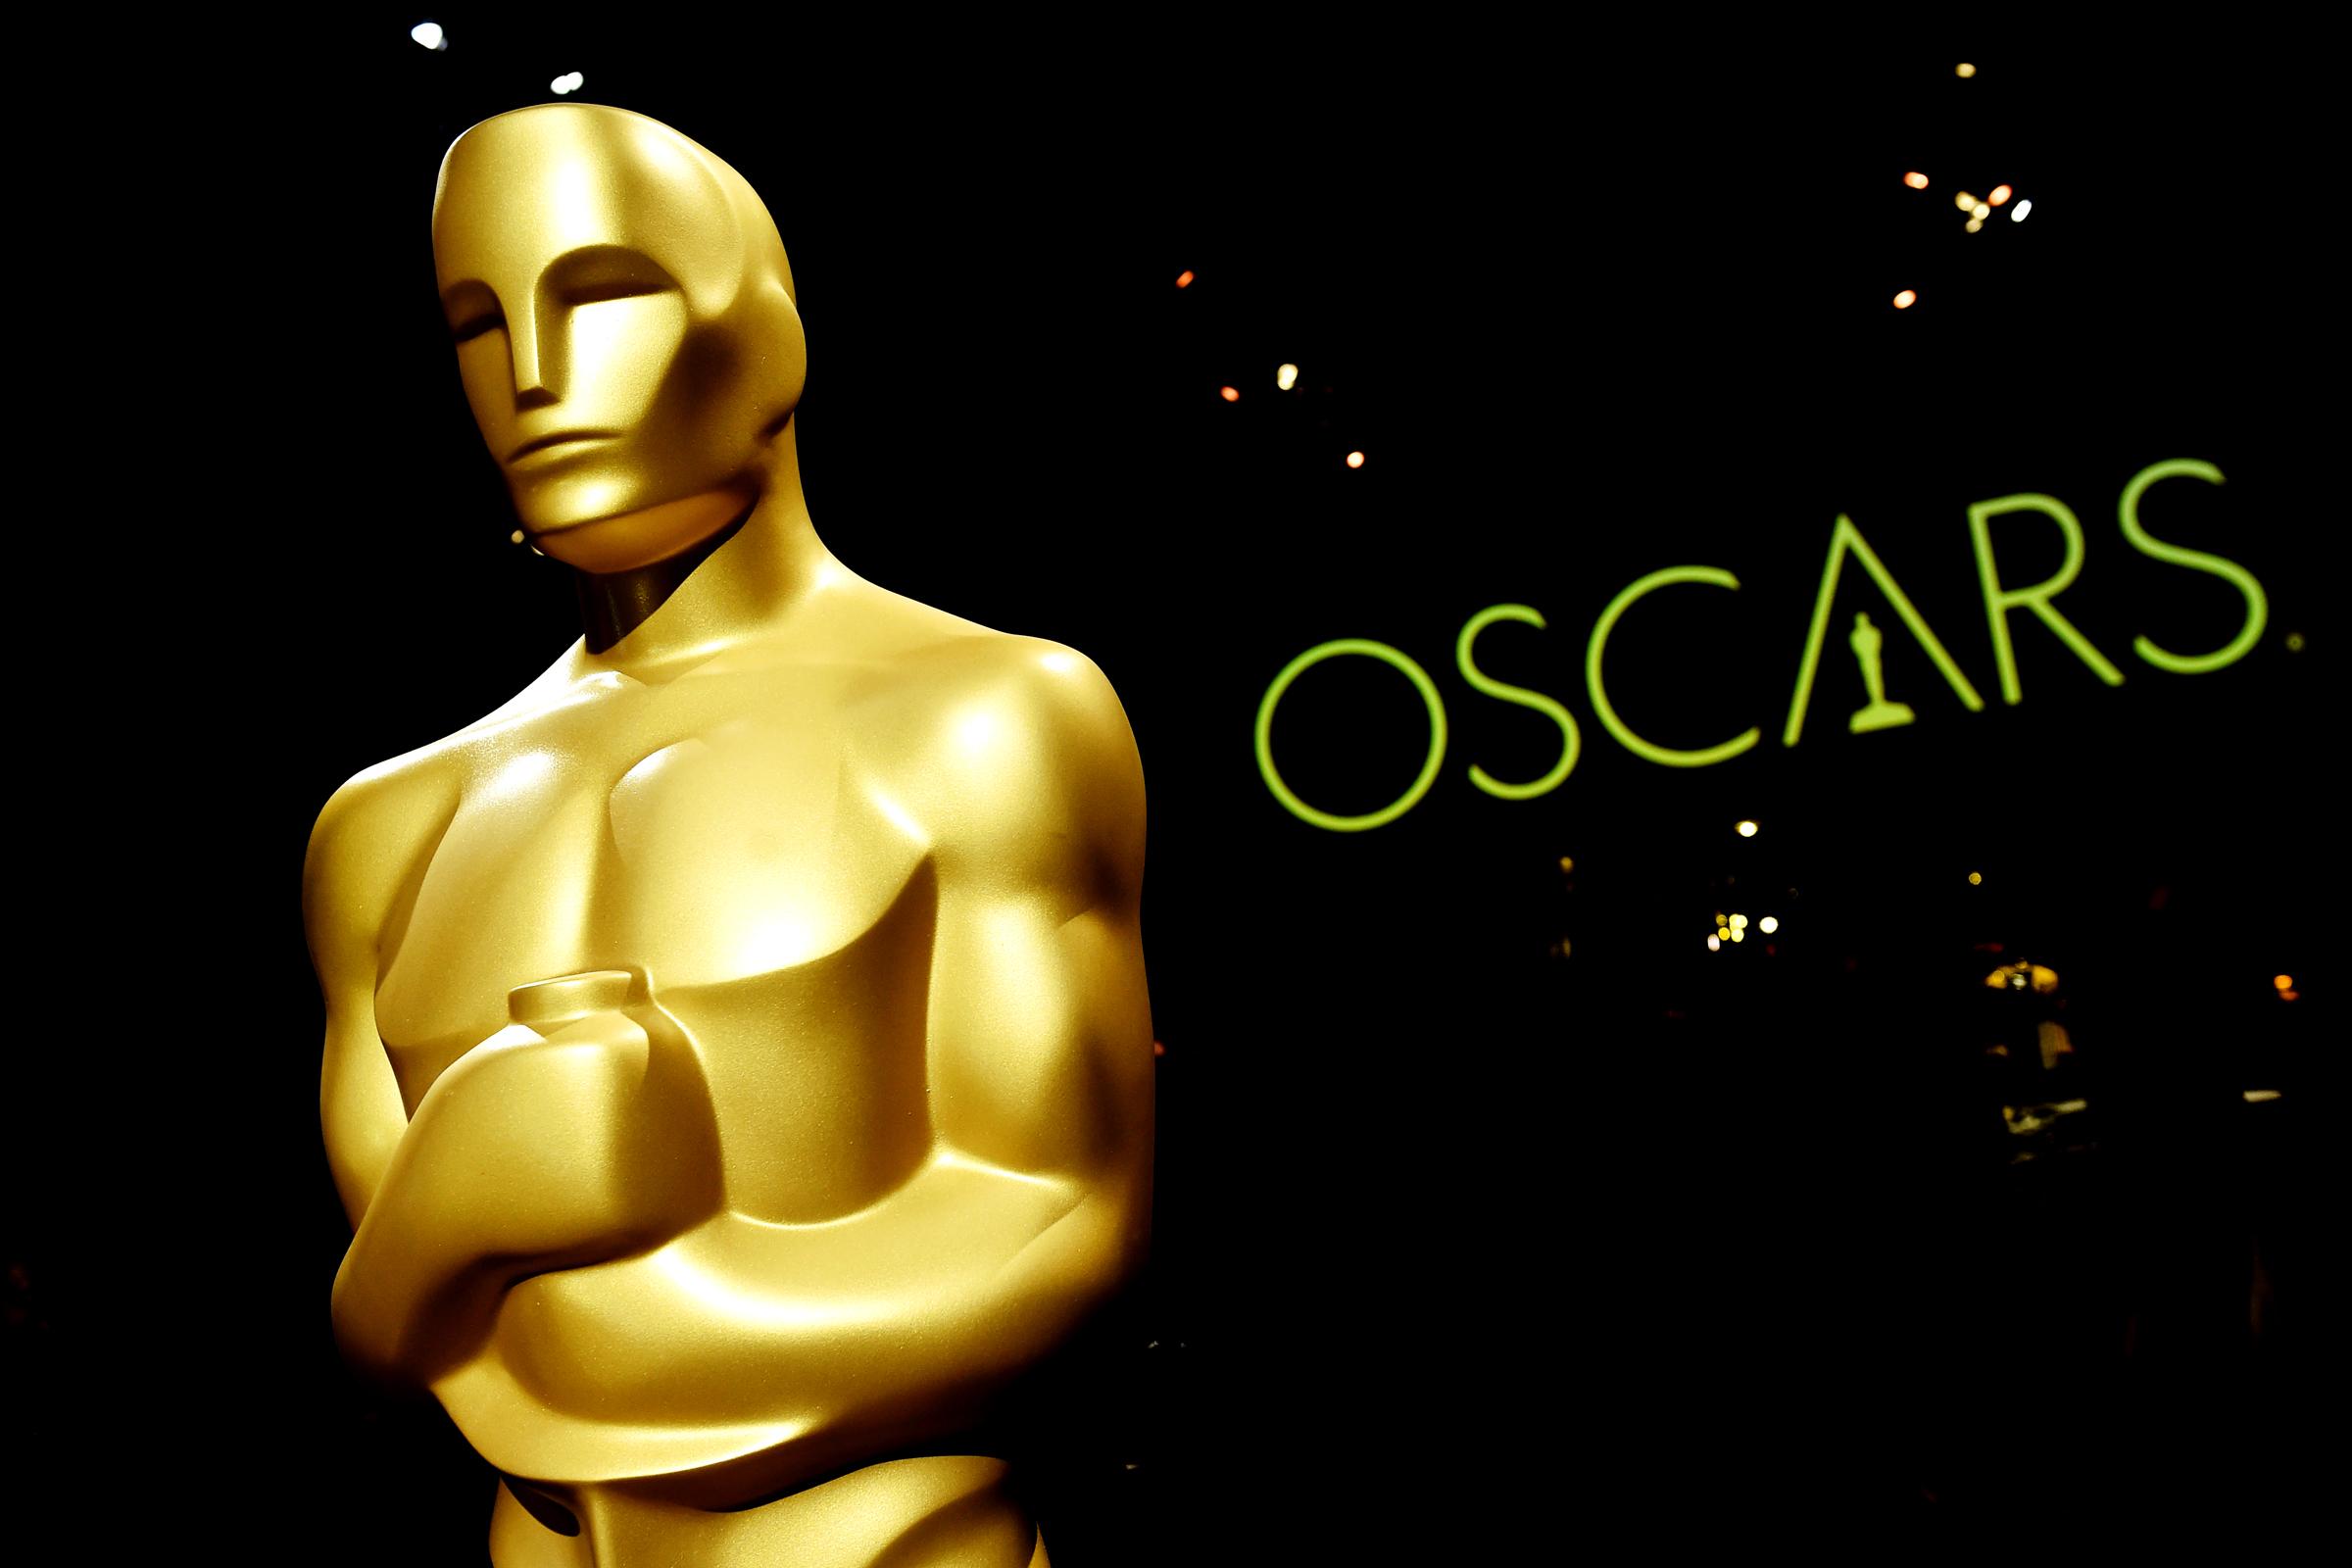 Oscars 2019: The Complete Winners List